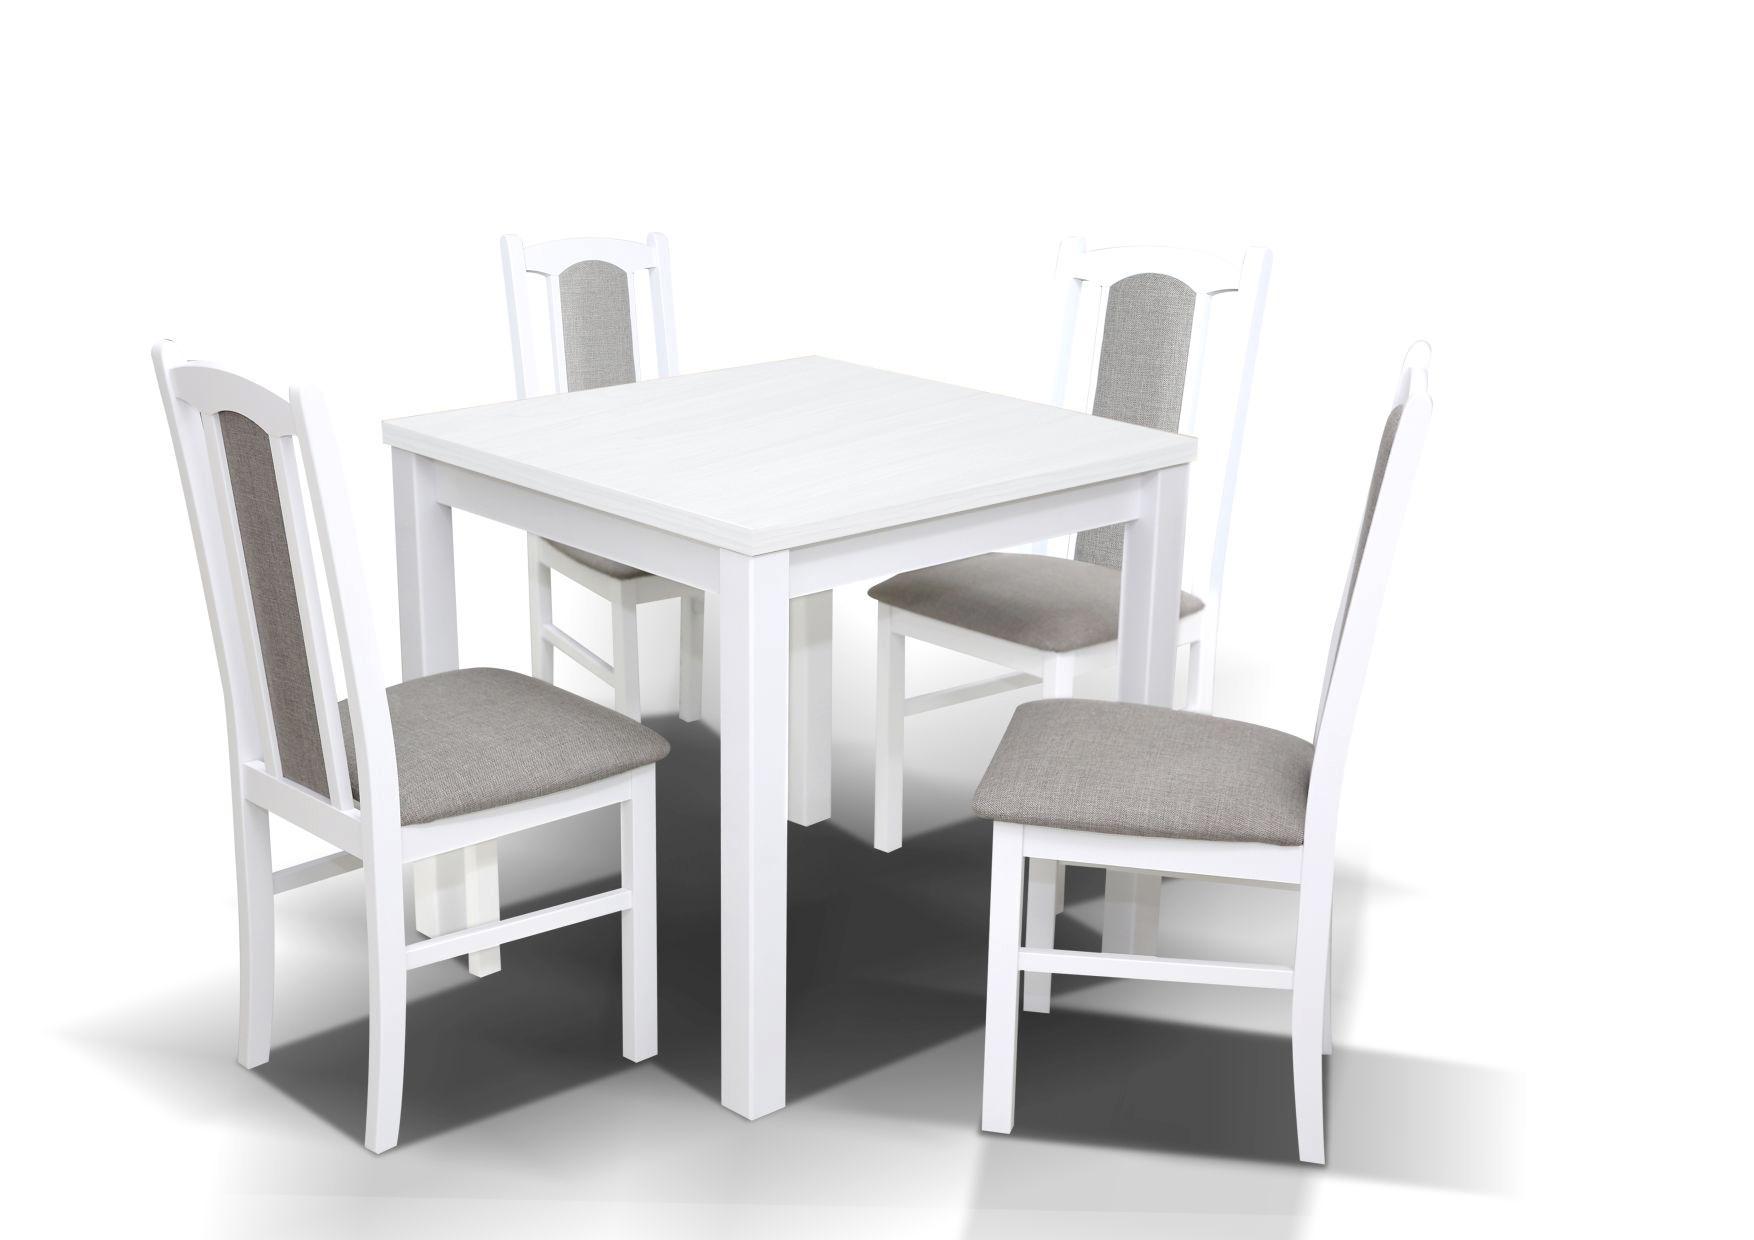 Zestaw nr 8 Stół GU IX + 4 krzesła MK VII mebleribes.pl